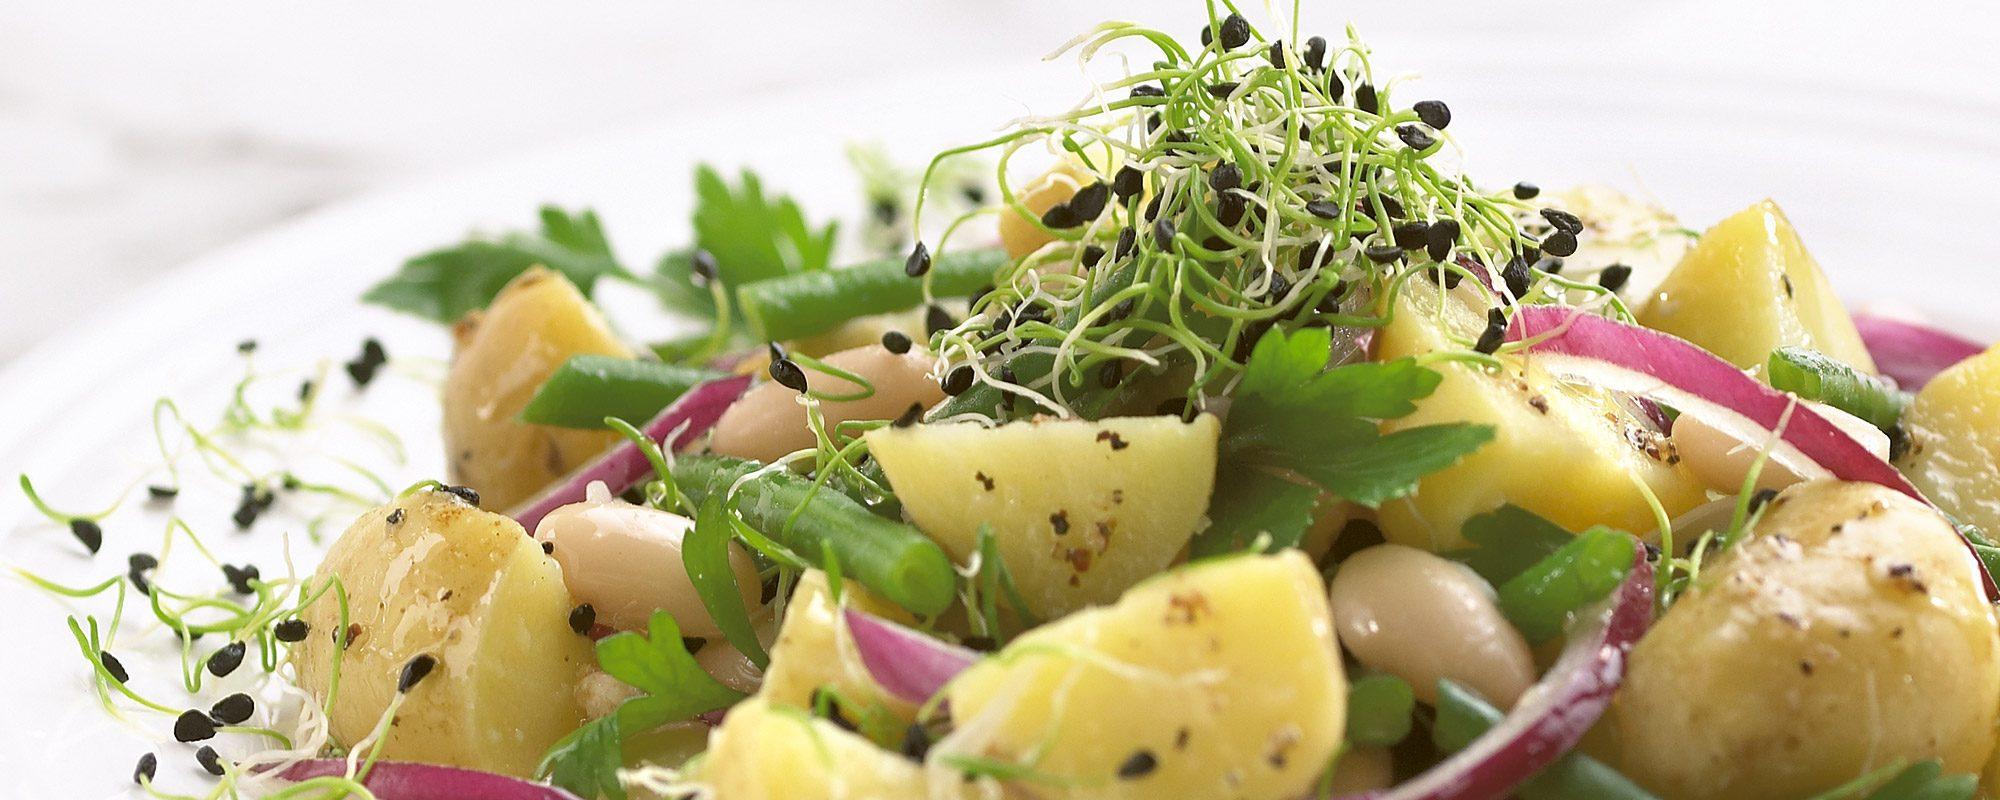 Garlic chives potato salad